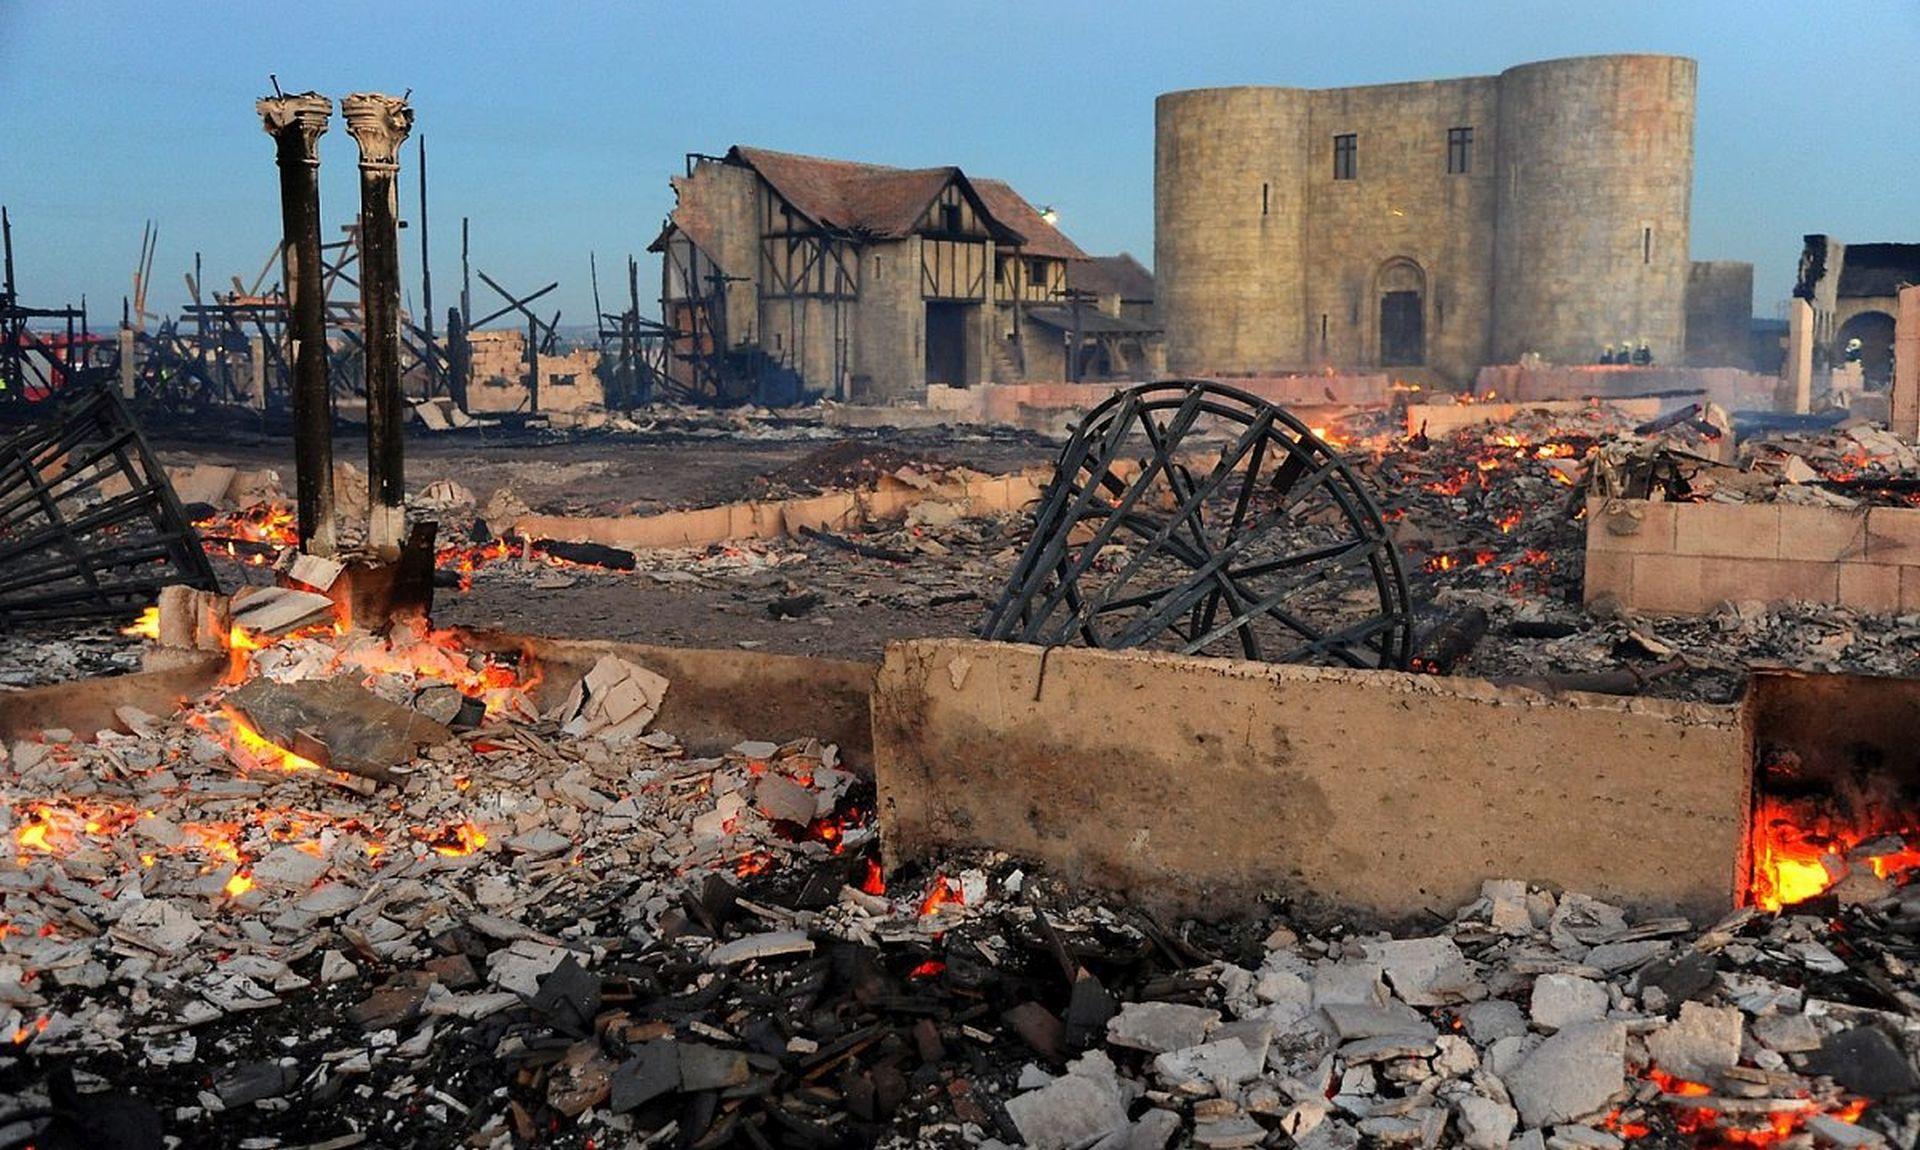 'EUROPSKI HOLLYWOOD' Požar uništio velik dio poznatog praškog filmskog studija